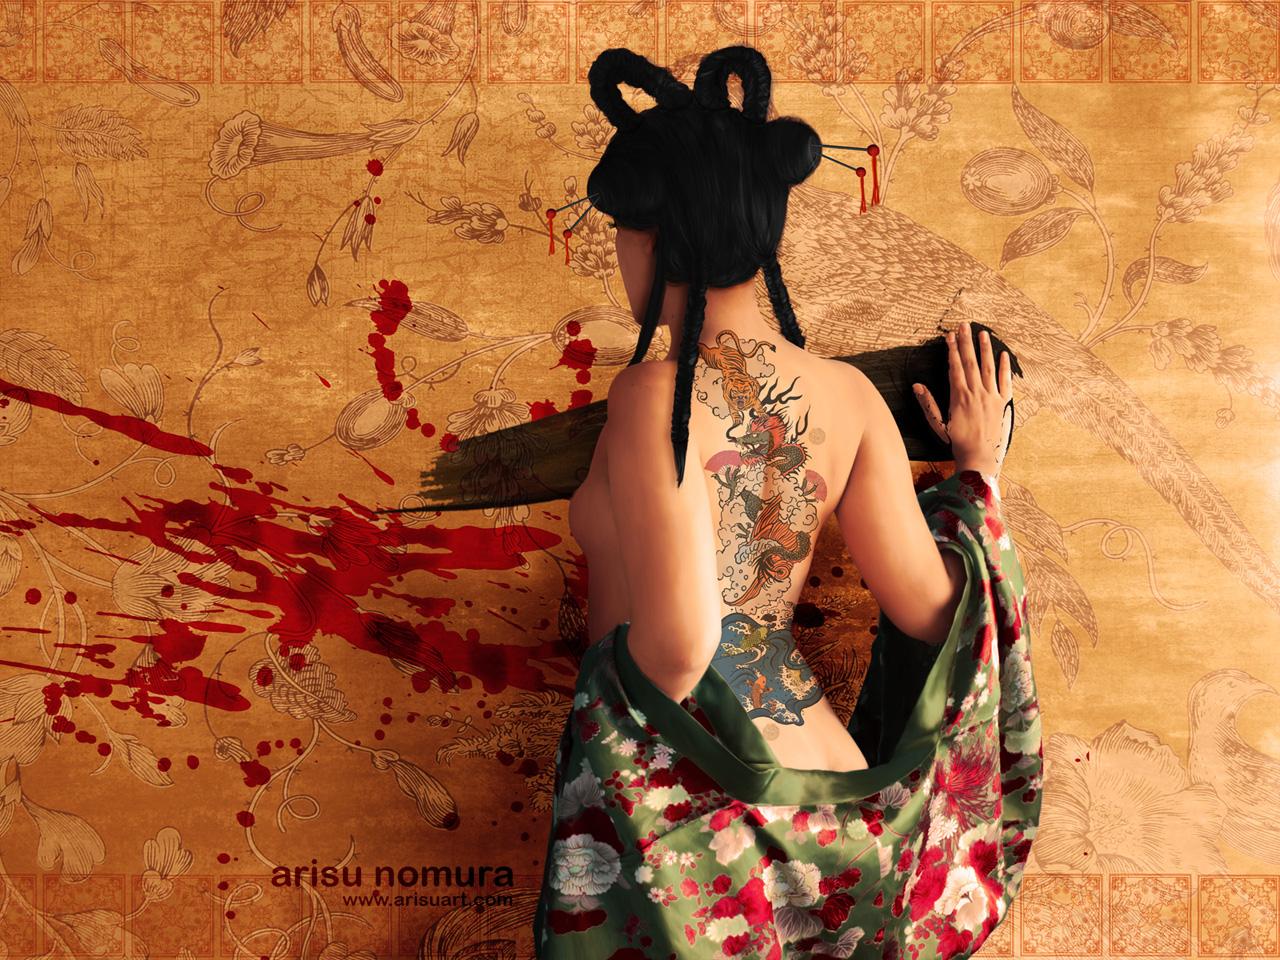 http://2.bp.blogspot.com/-Qmyiaf0KnGo/TnxcIMlRF4I/AAAAAAAABRg/cqbgvWpsmMk/s1600/Tiger+Girl+Tattoo-461776.jpeg